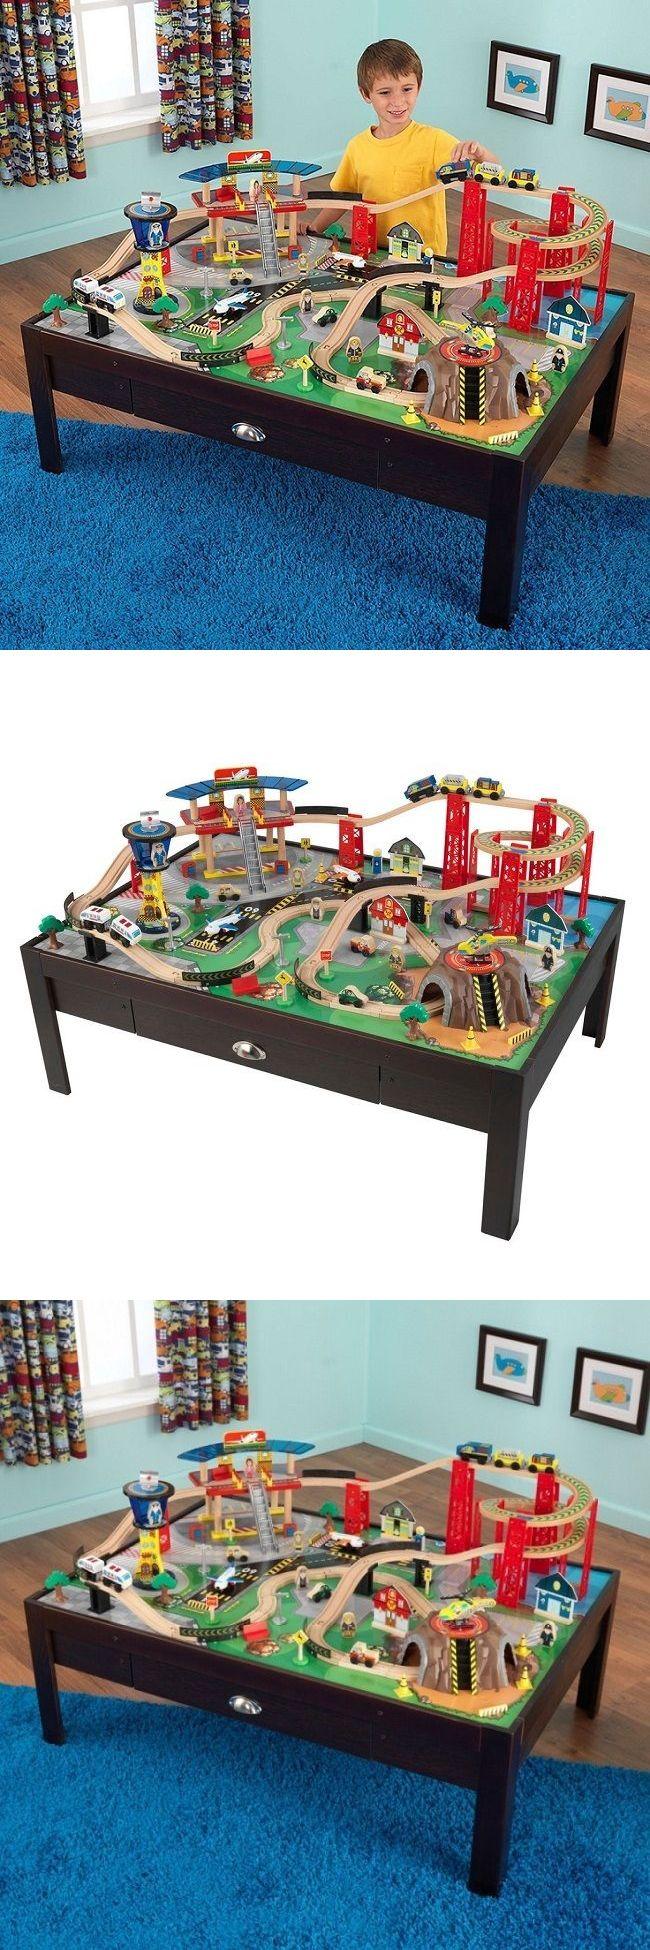 best  brio toys ideas on pinterest  train table lego duplo  - brio compatible  big train set toy kids birthday table expresstoddler potty scale model